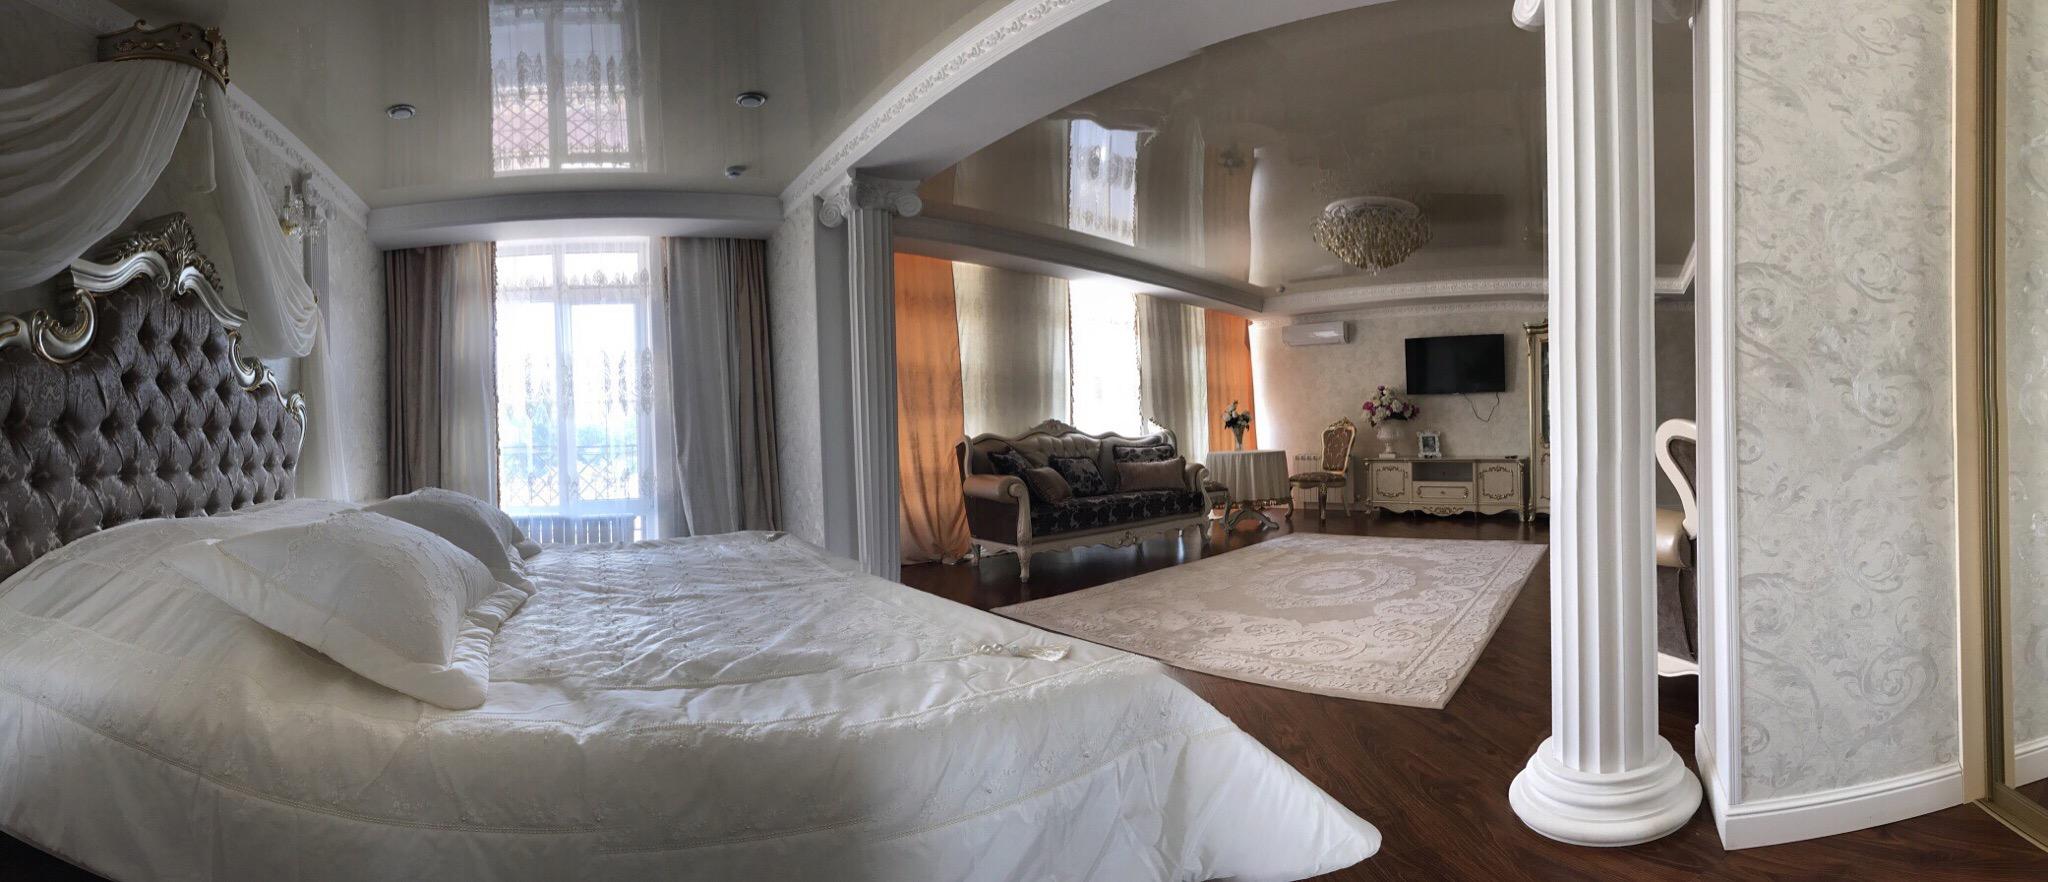 Двухкомнатные апартаменты, спальня вид